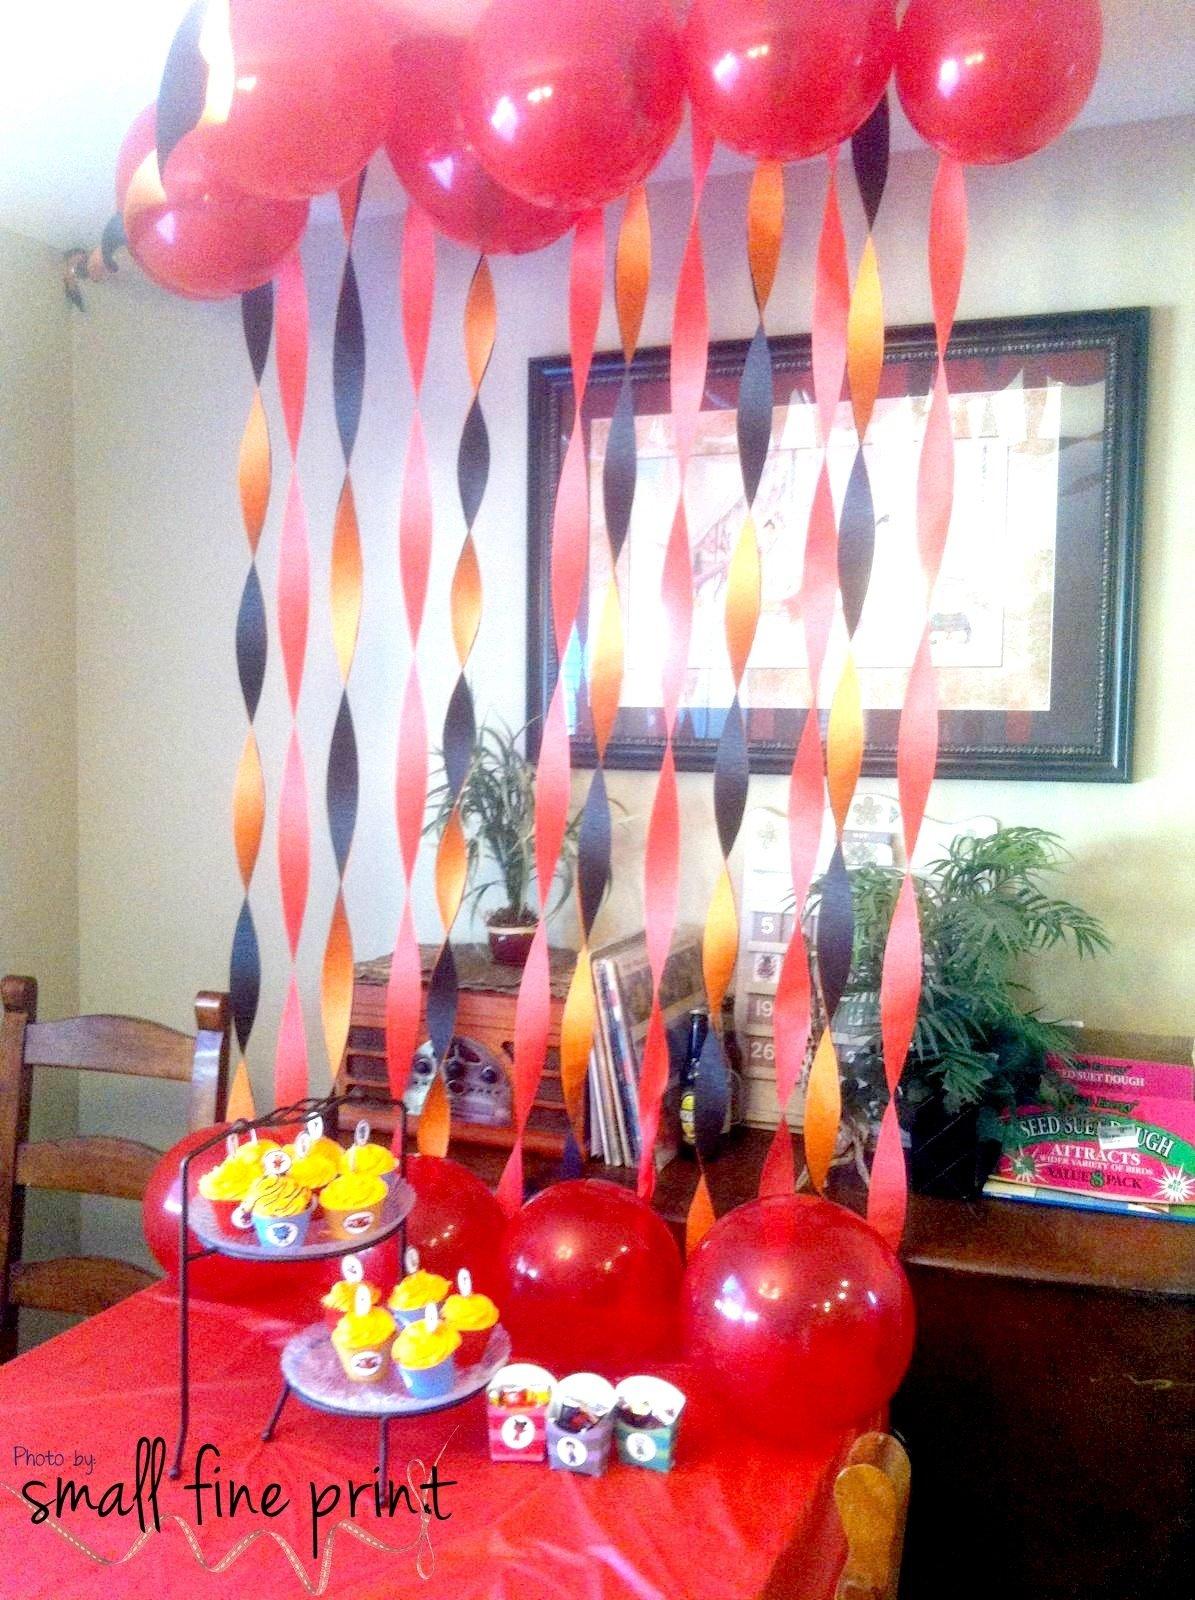 10 Famous Daniel Tiger Birthday Party Ideas daniel tigers neighborhood theme party smallfineprint 2021